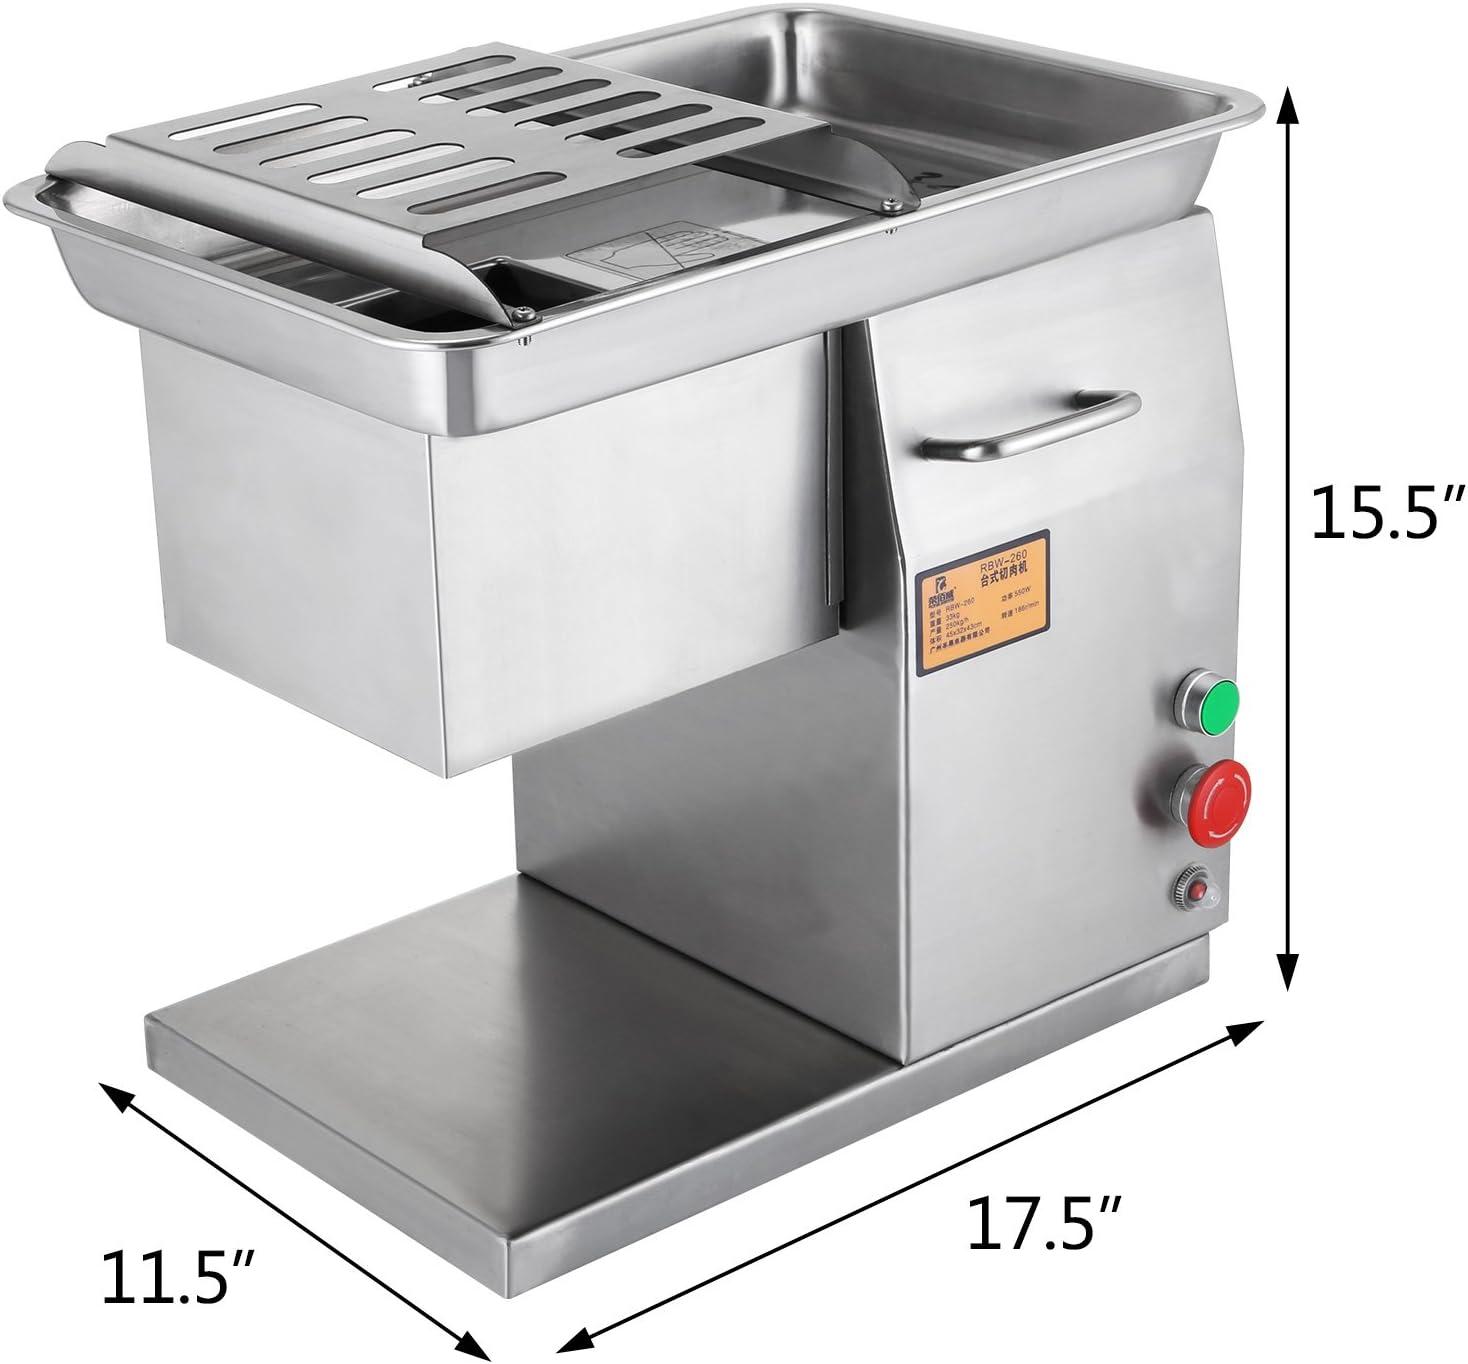 Cueffer 500W 250 kg/h Cortadora de Carne Máquina de Corte de Carne Máquina de Cortar de Acero con Espesor de 2mm-20mm Máquina Eléctrica de Cortar Carne para Restaurantes Meat Cutter Machine: Amazon.es: